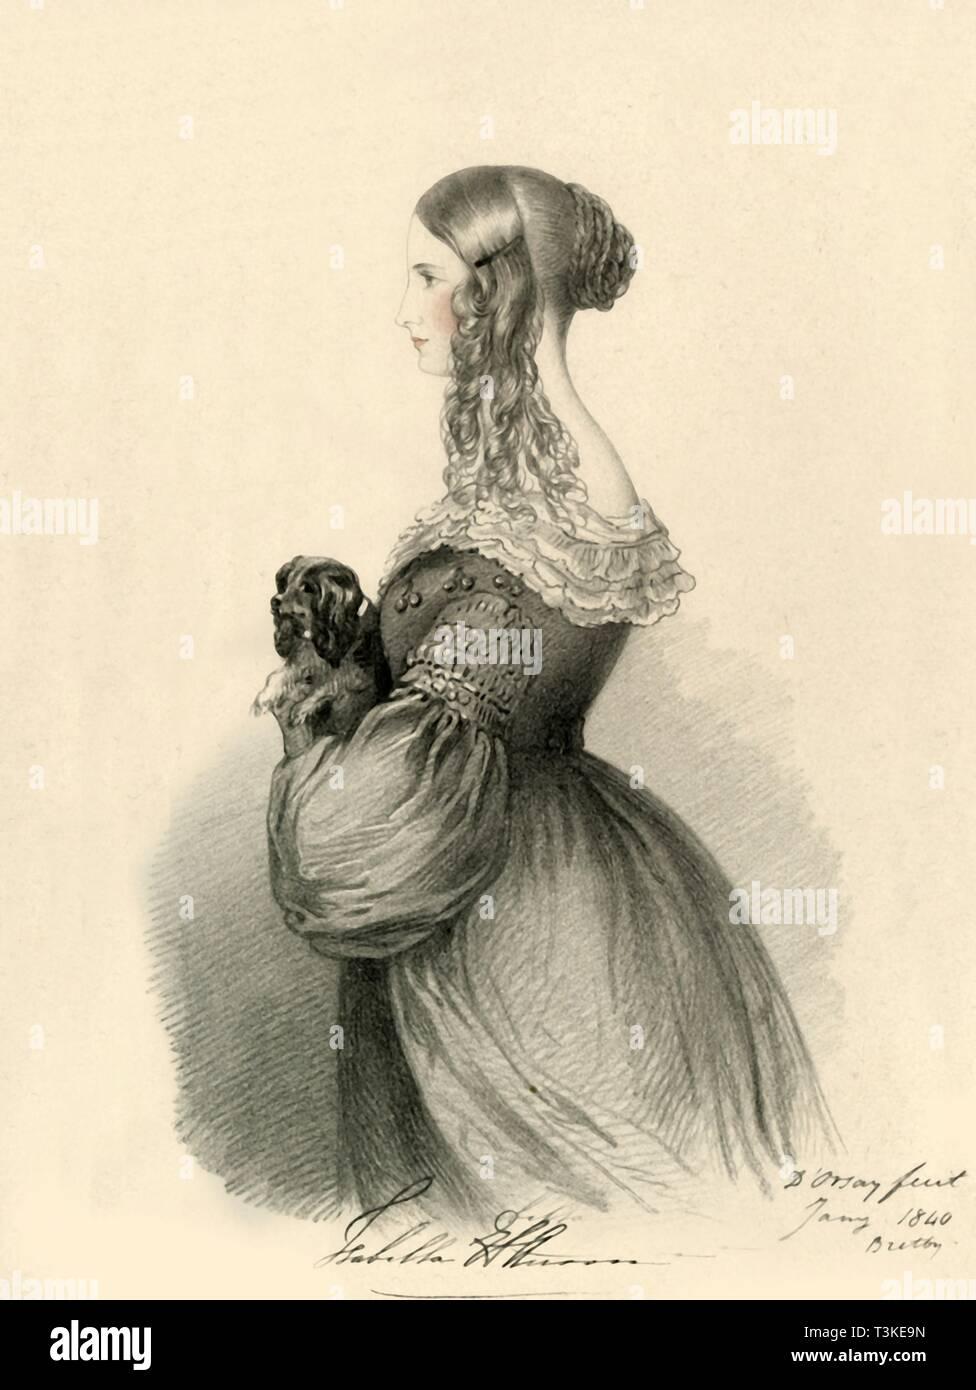 'Isabella Anson', 1840. Creator: Richard James Lane. - Stock Image